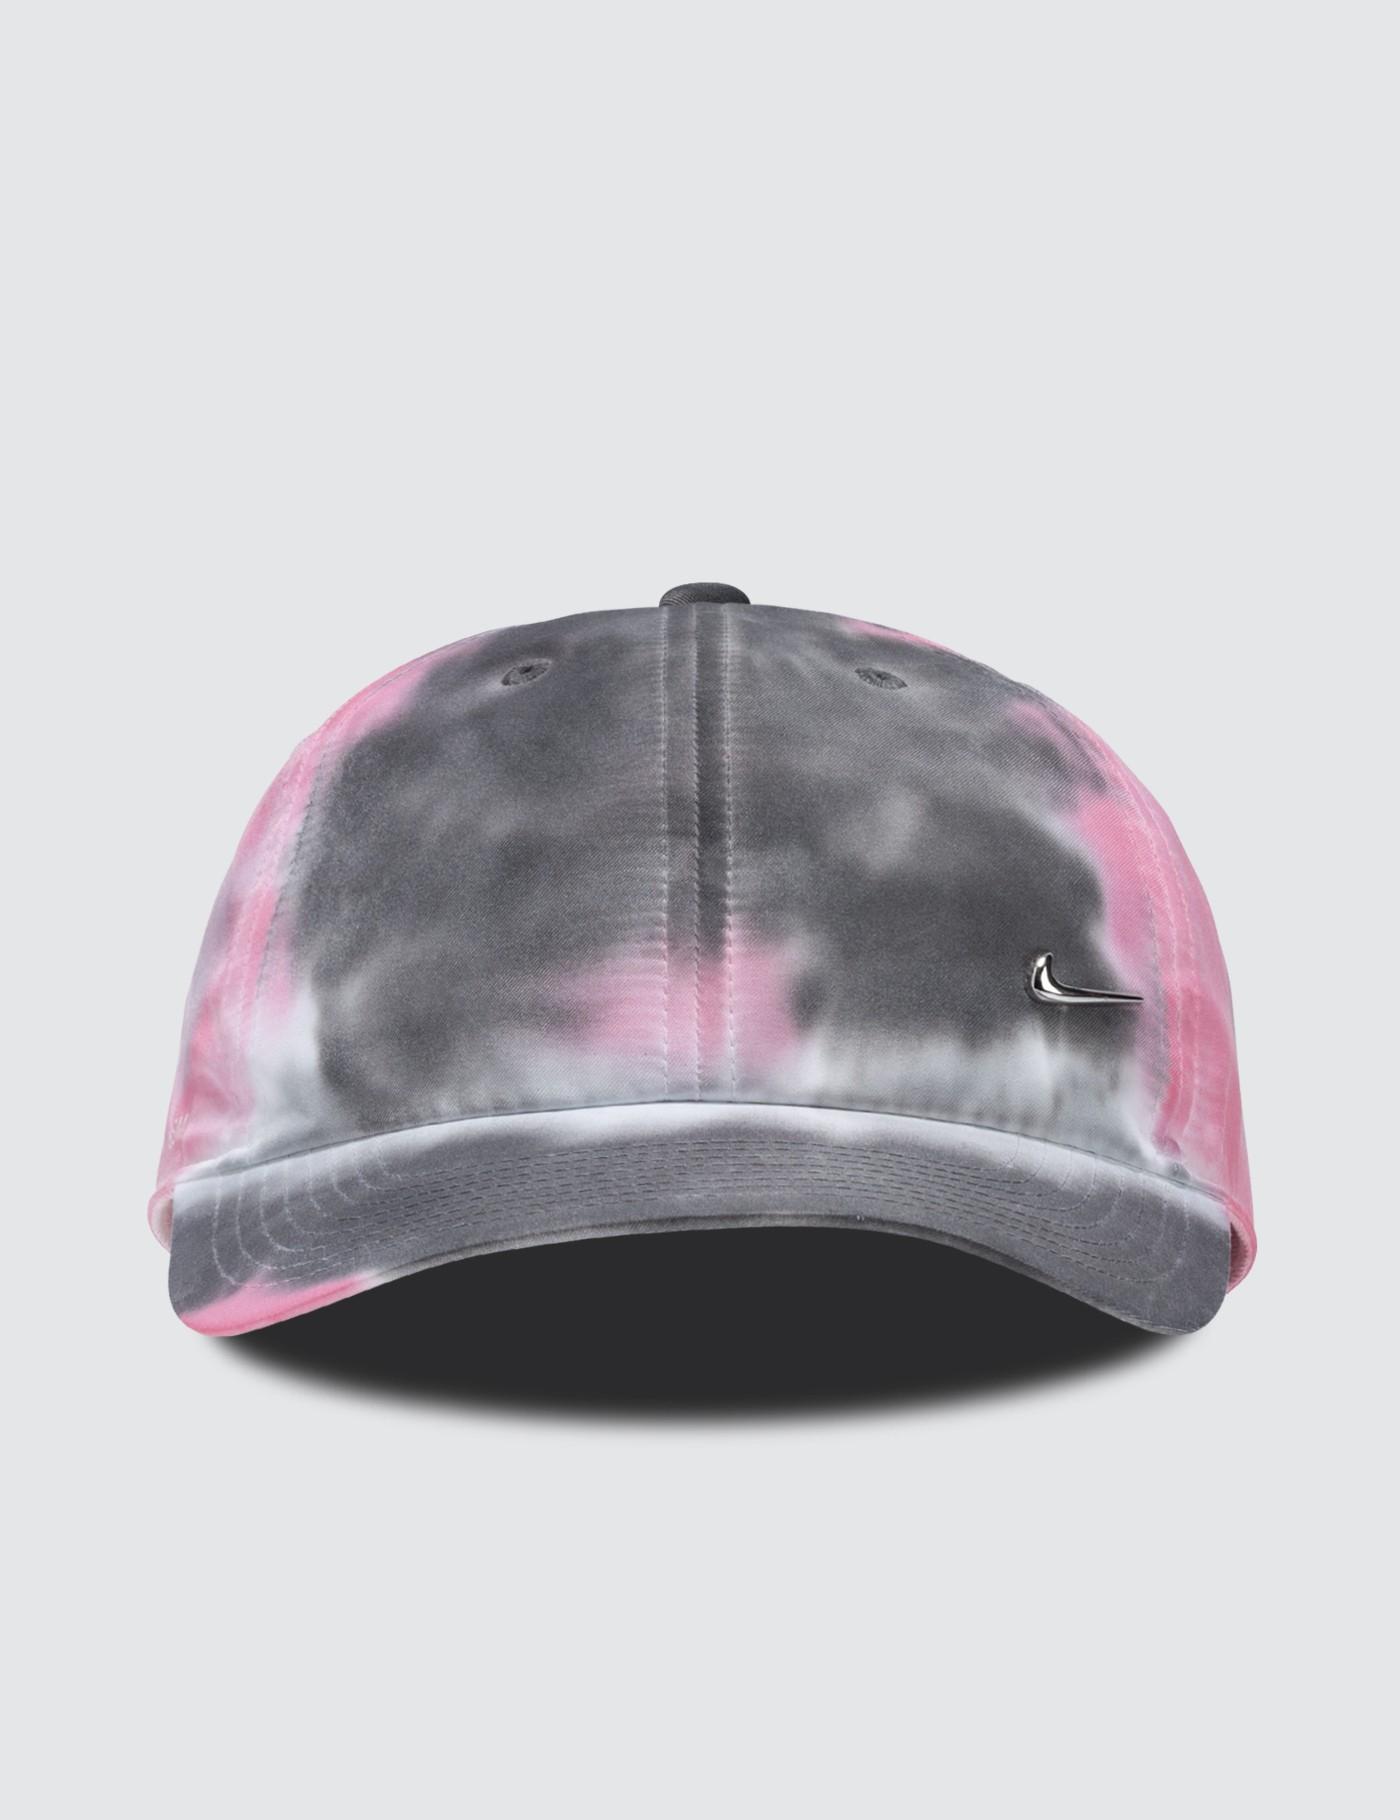 65e7b1418542 ... Nike Cap for Men - Lyst. View fullscreen